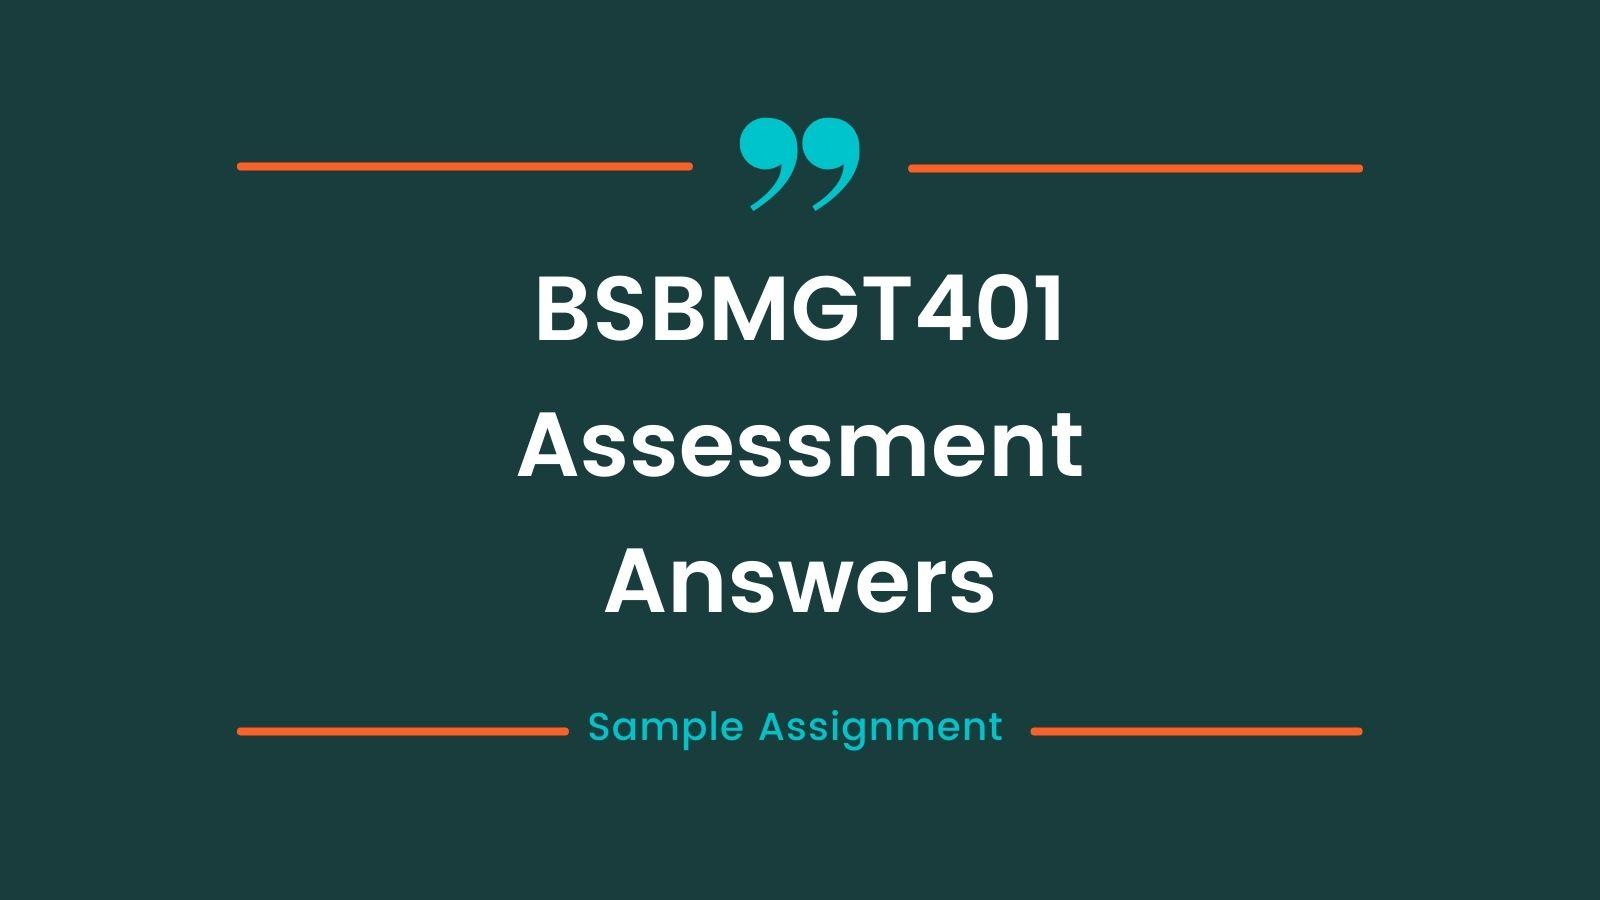 BSBMGT401 assessment answers